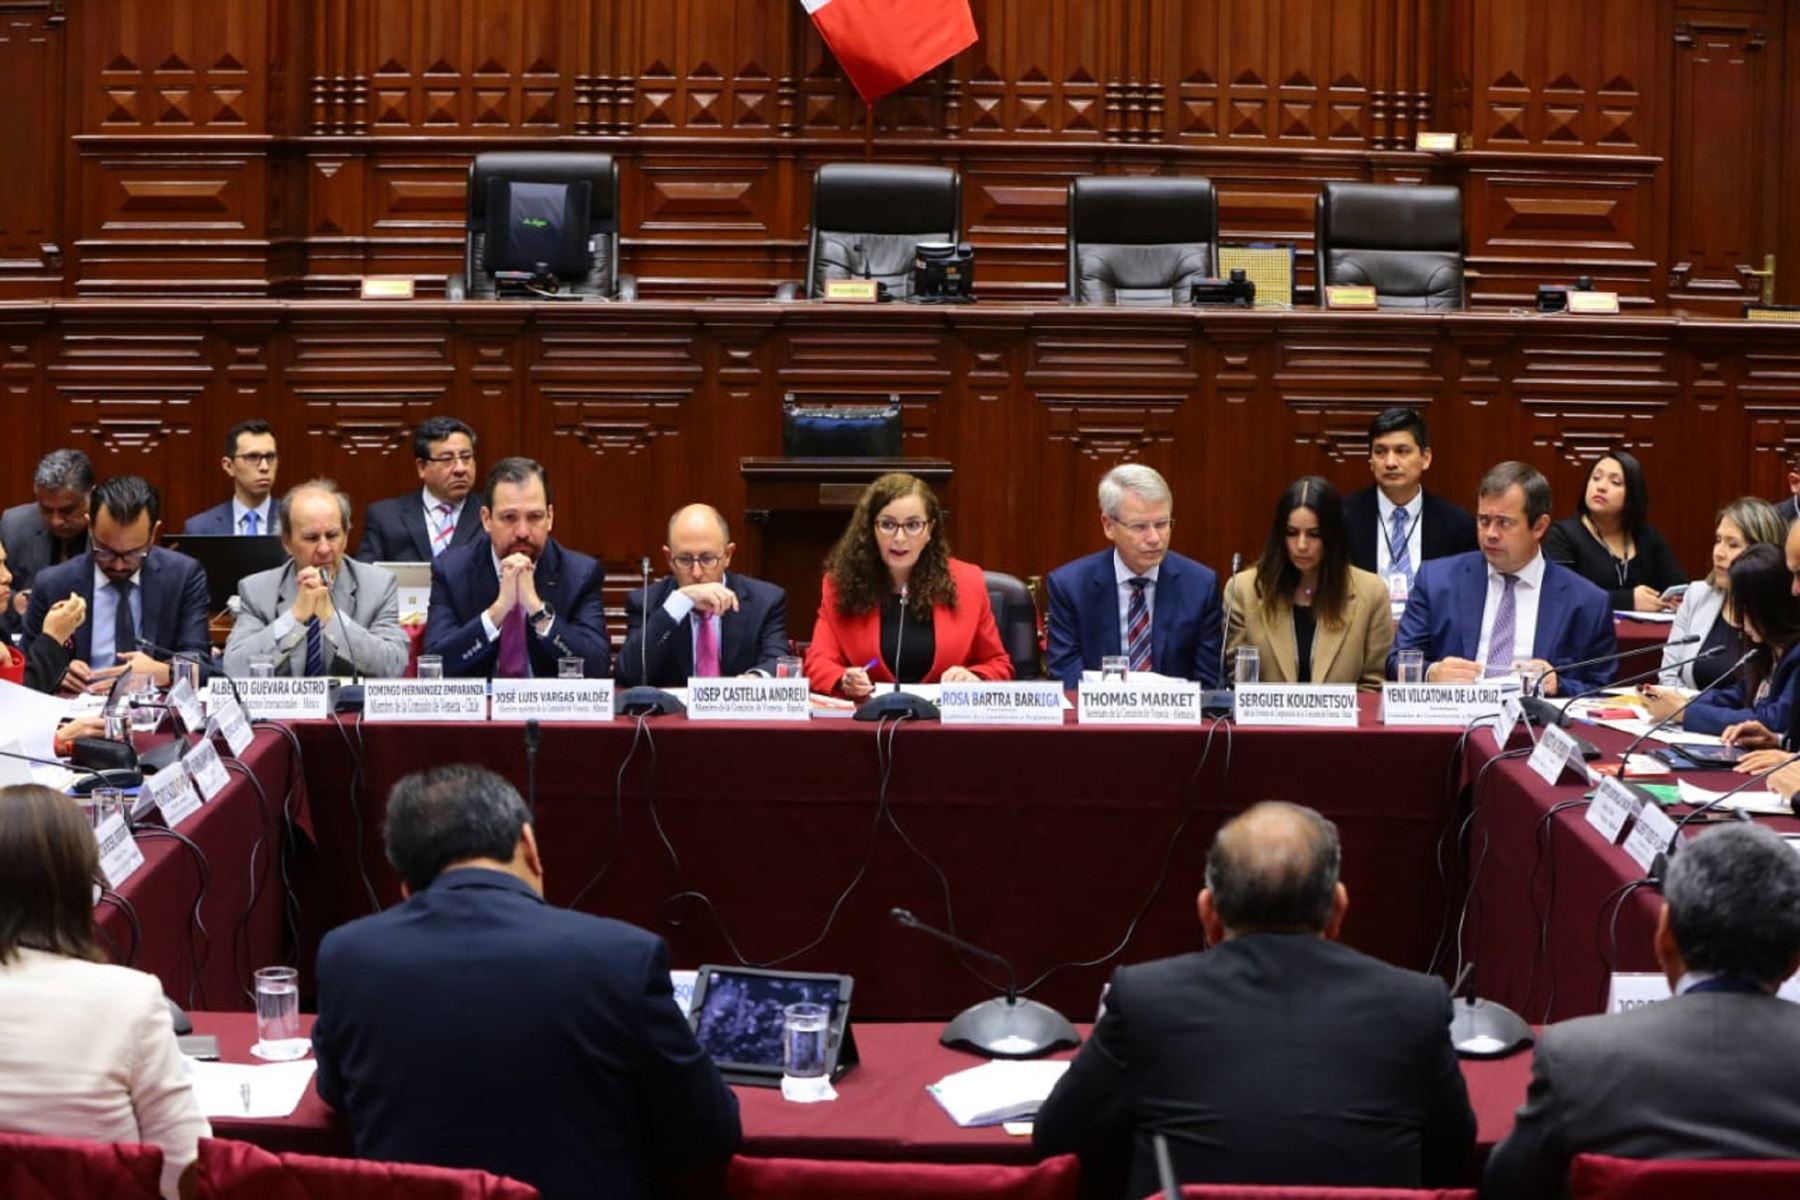 Comsión de Constitución. Comisión de Venecia